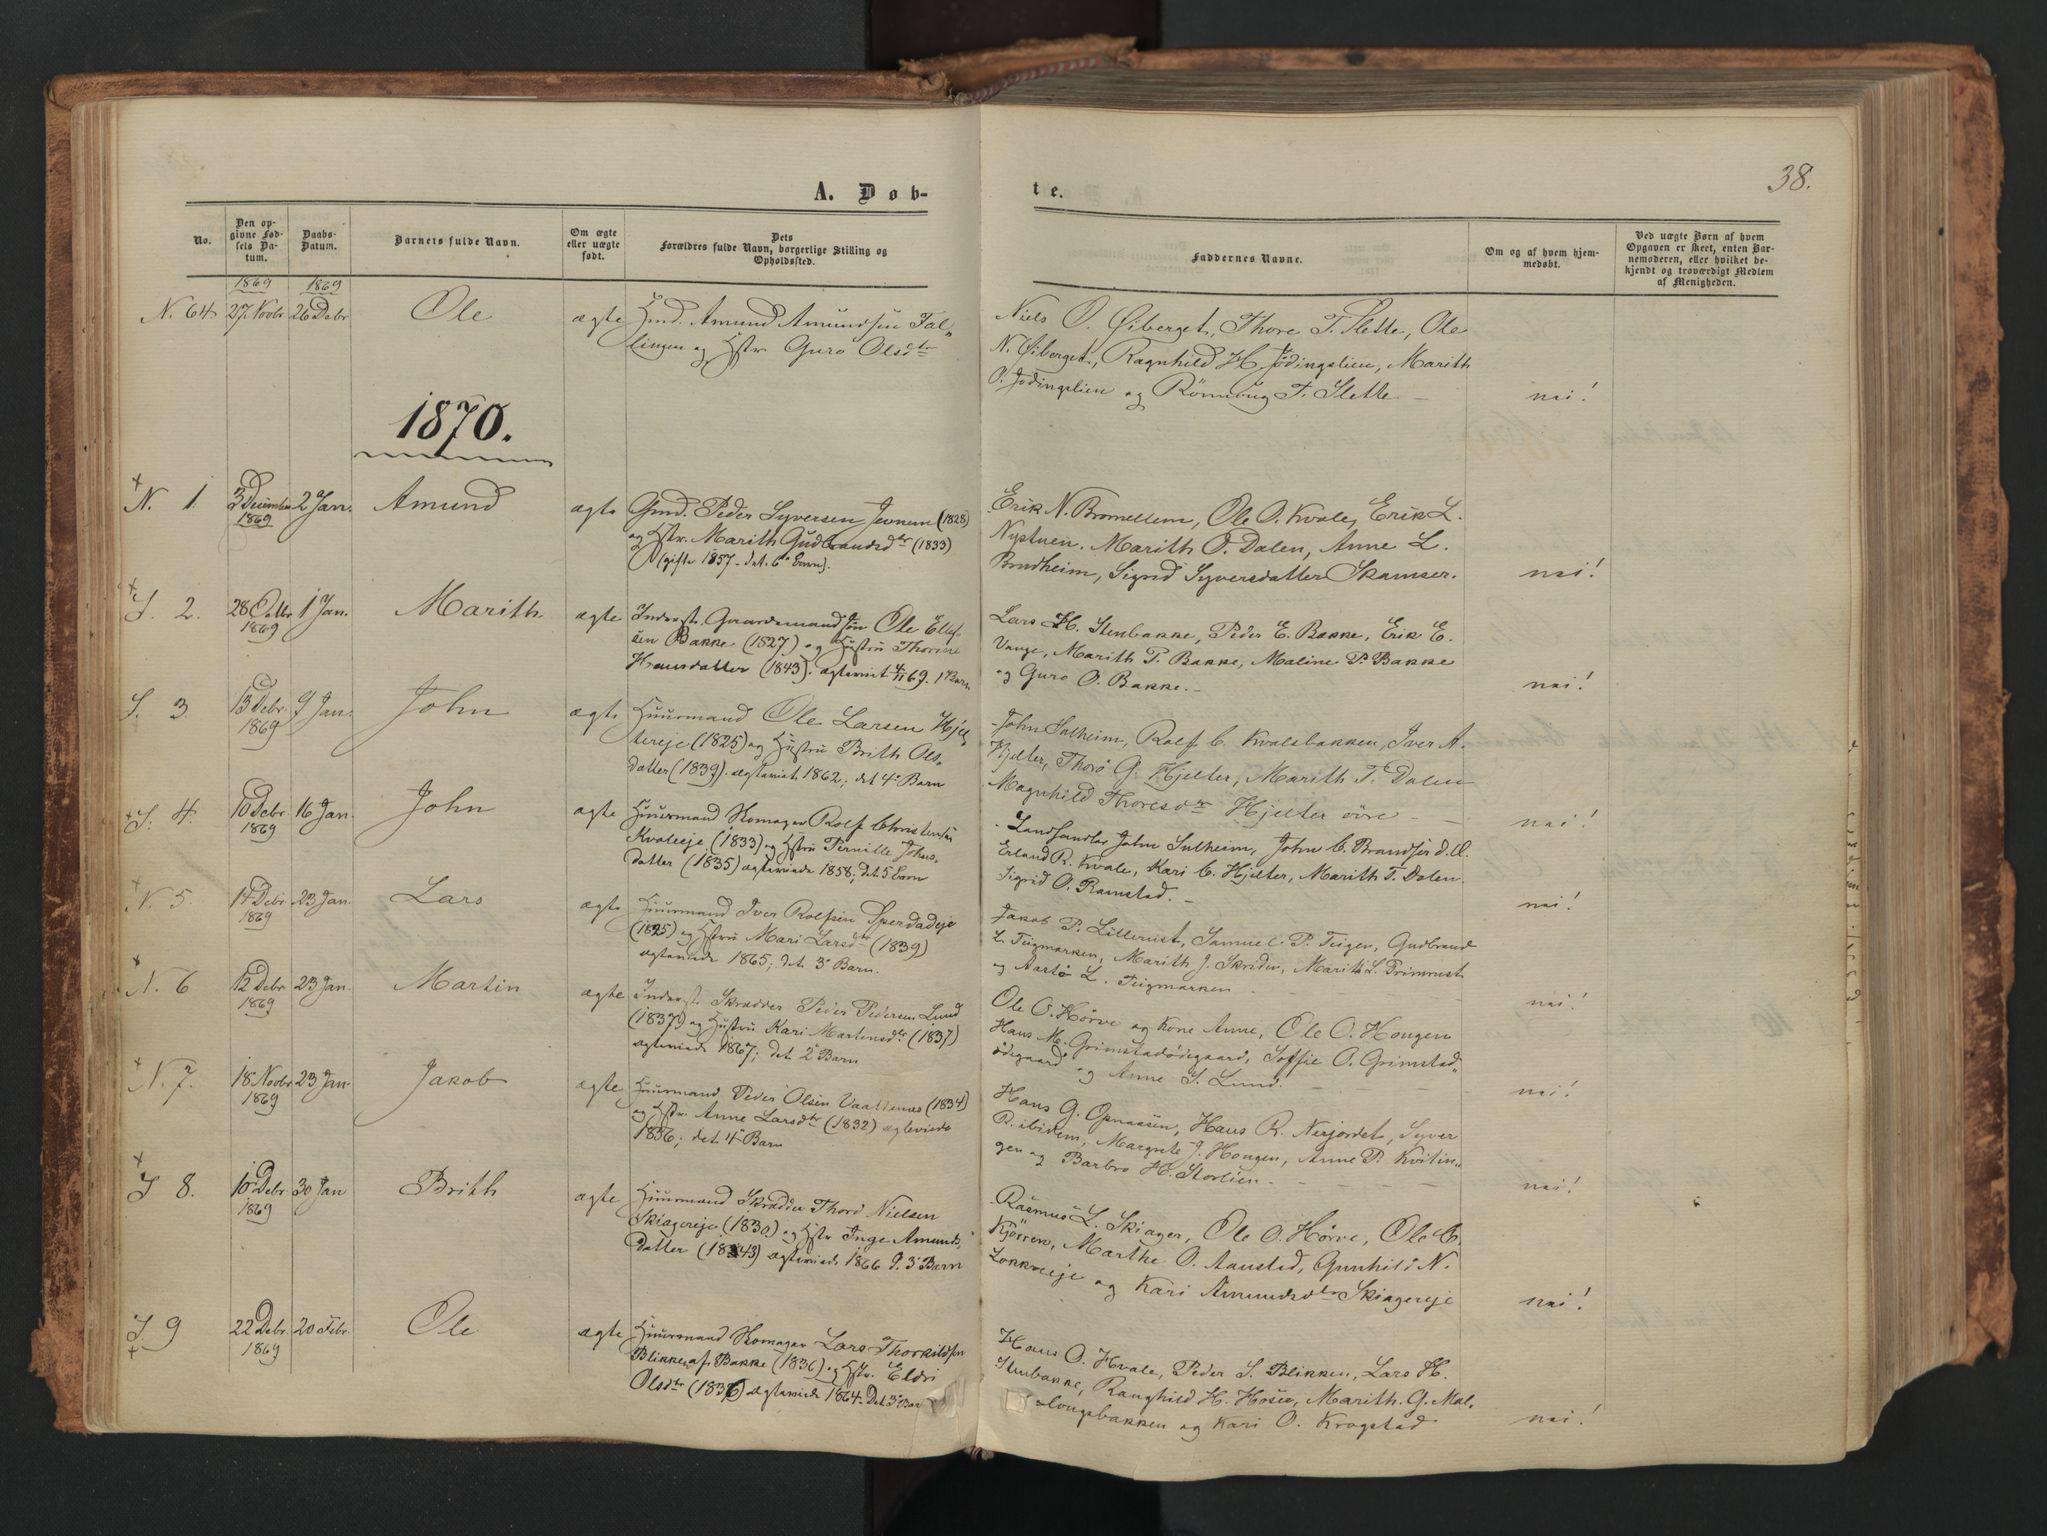 SAH, Skjåk prestekontor, Ministerialbok nr. 1, 1863-1879, s. 38